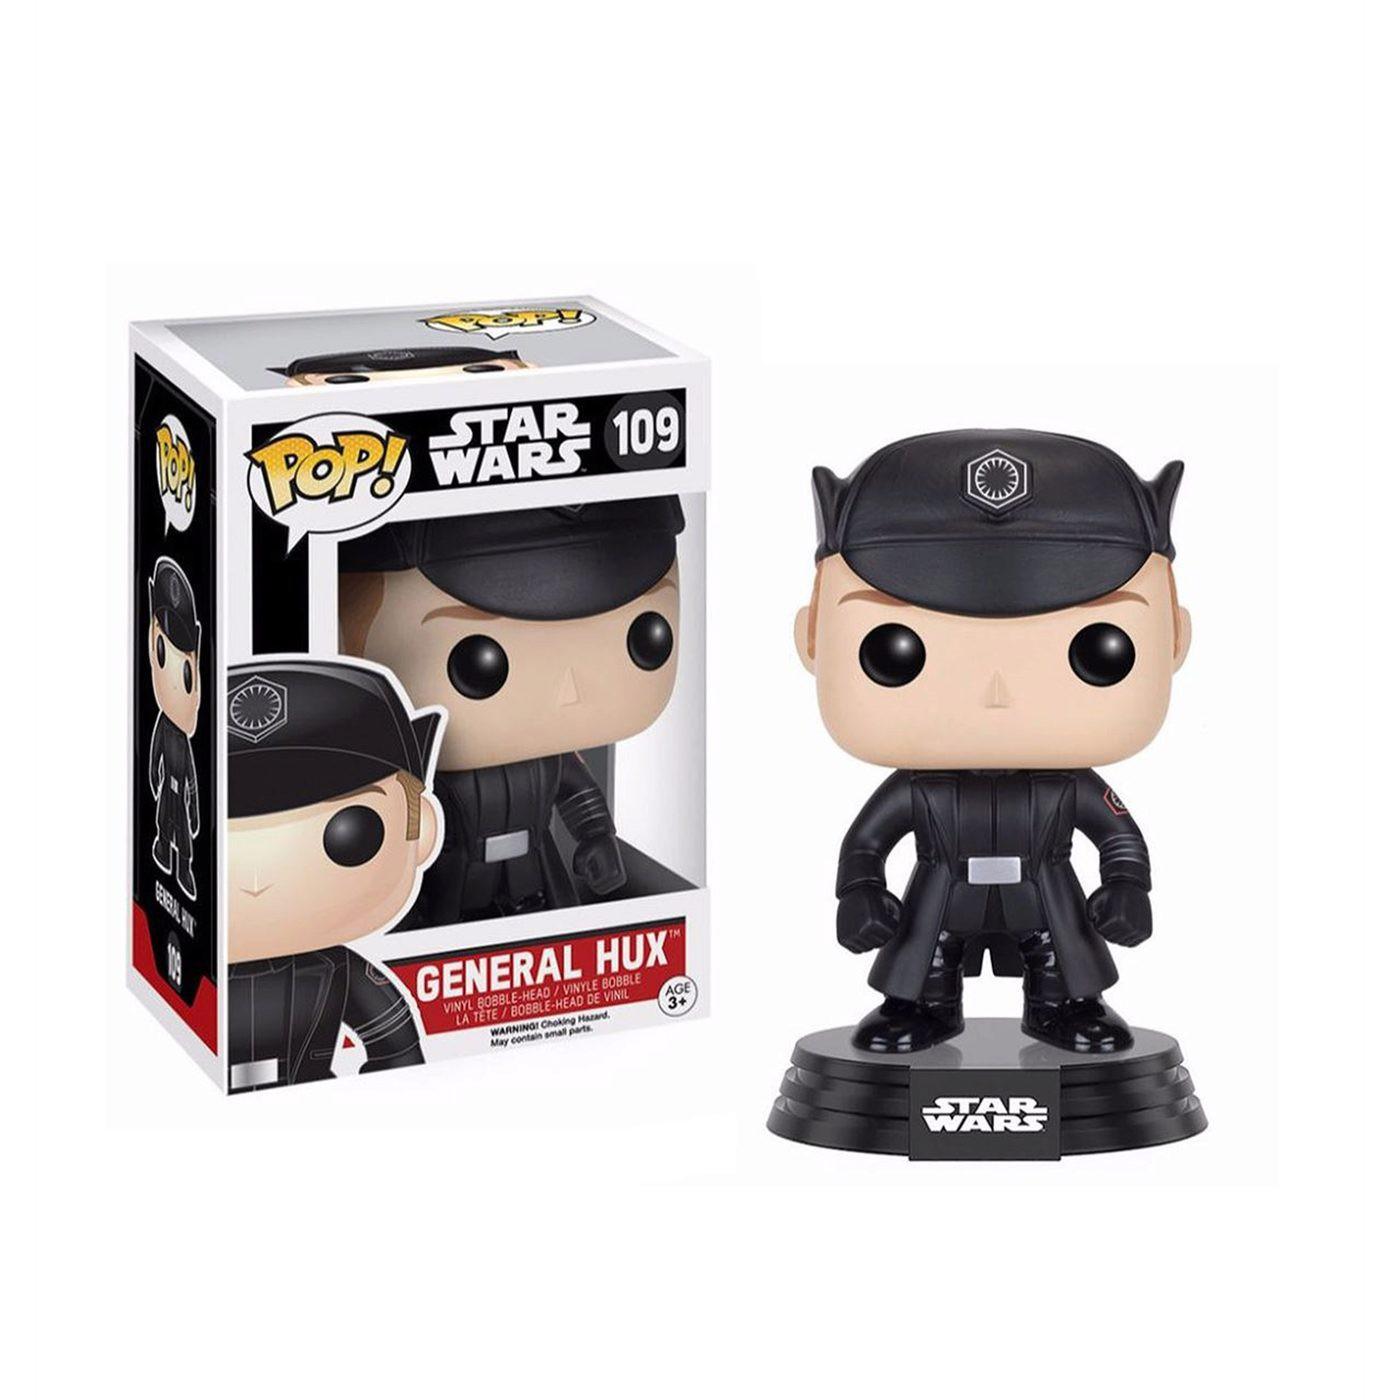 Star Wars General Hux Funko Pop Vinyl Bobble Head